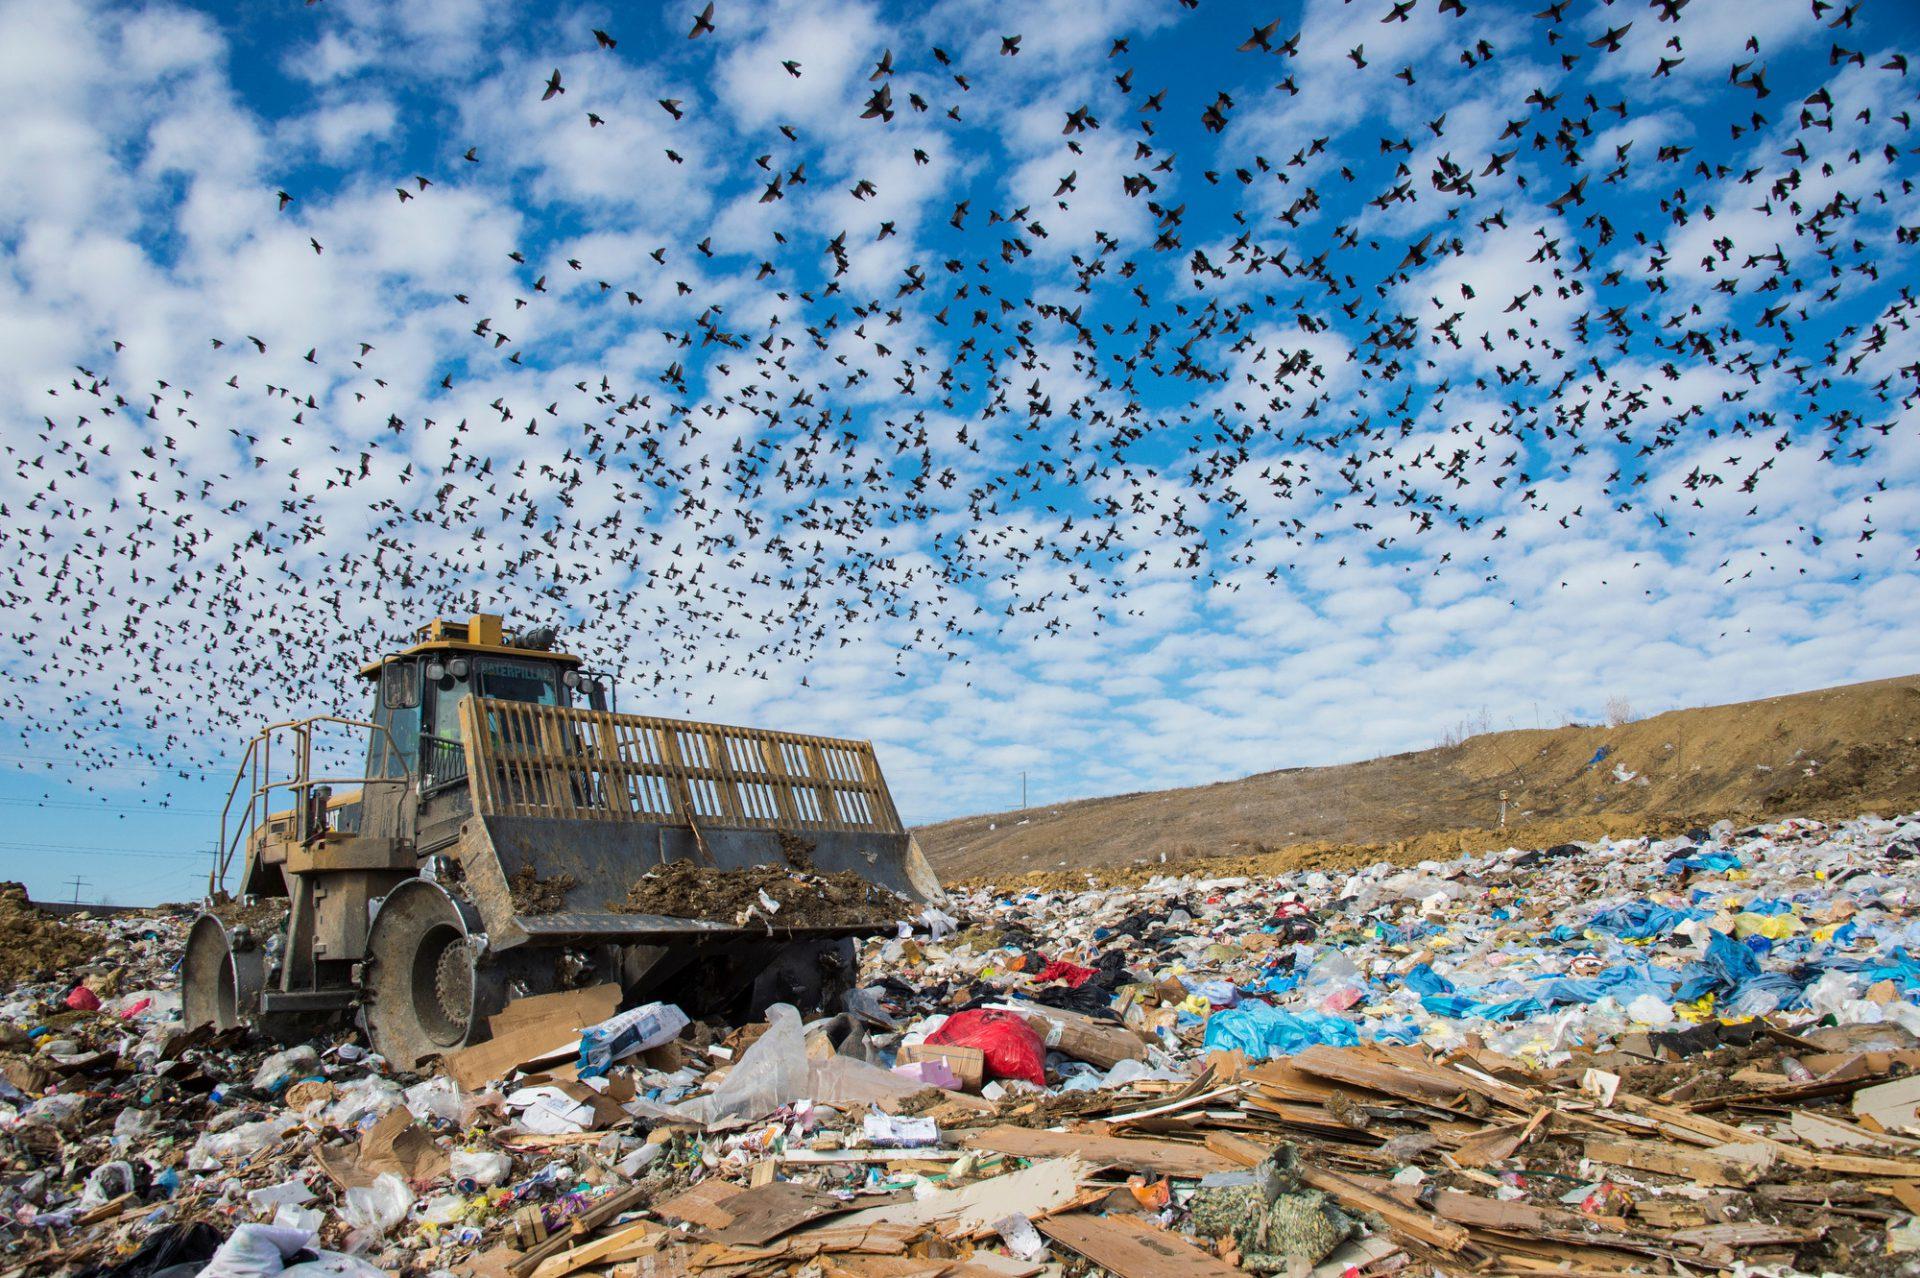 Photo: Common starlings pick for food in the garbage in the landfill in Lincoln, Nebraska.